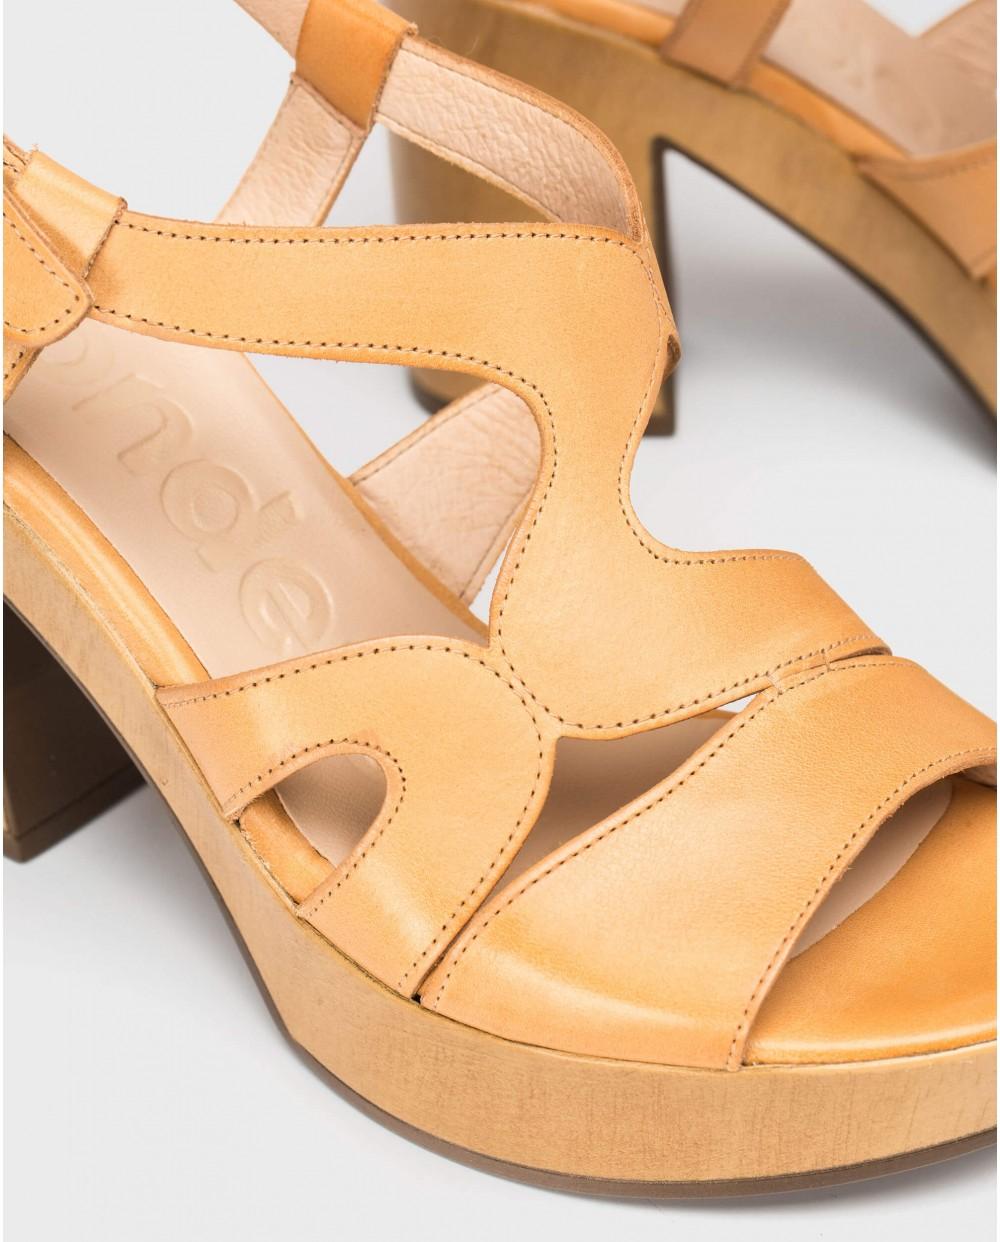 Wonders-Heels-Platform sandal with wavy straps